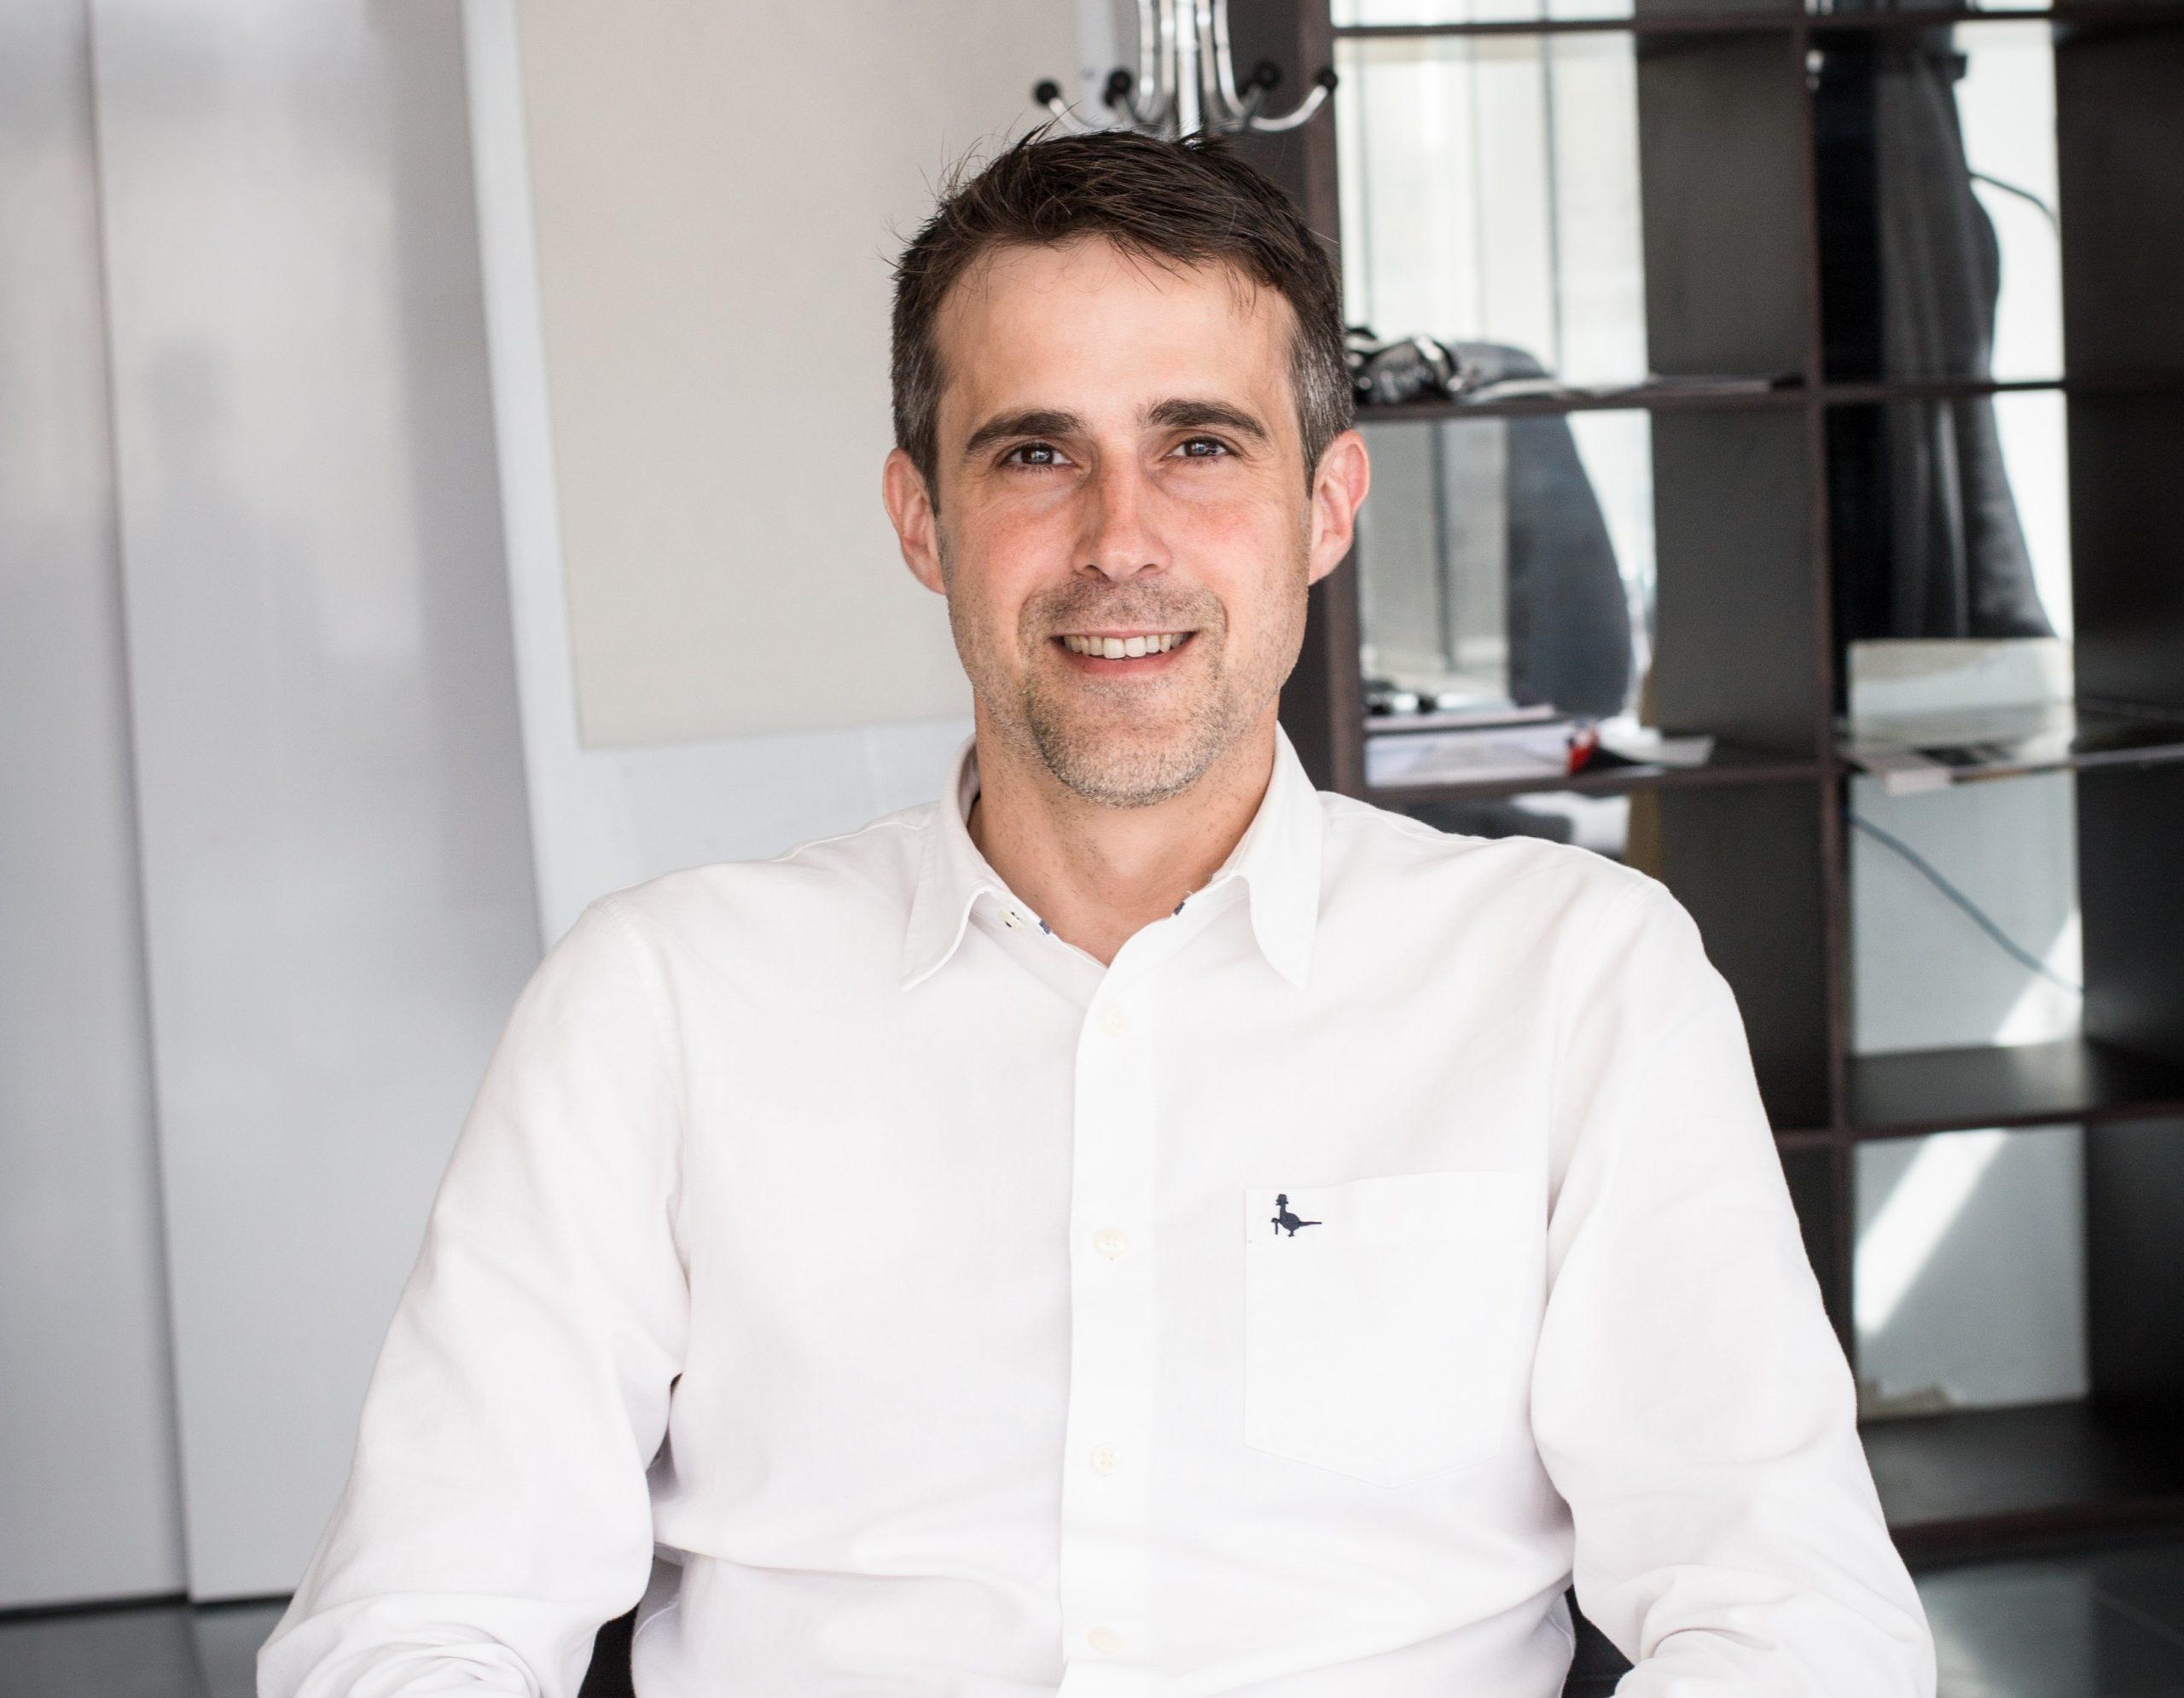 Gonzalo de la Mata joins Amazon Agency Molzi as Head of Global Agency Development